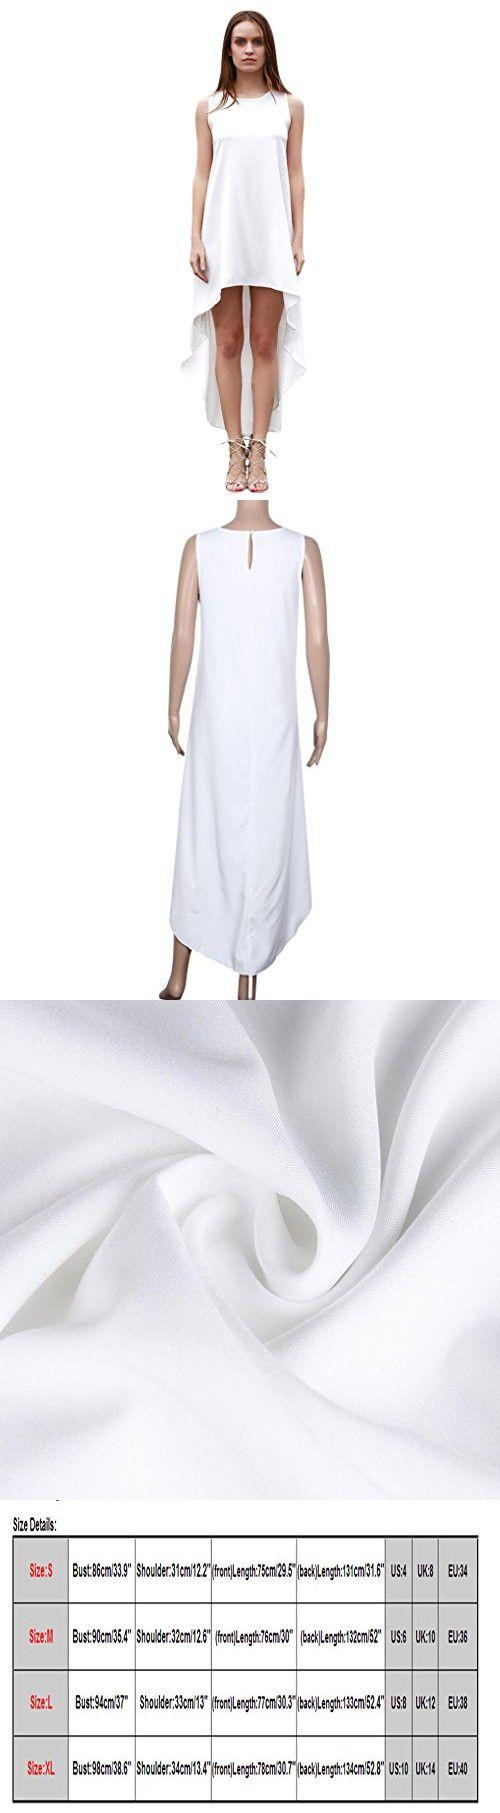 Sunward(TM) Women Sleeveless Chiffon Long Irregular Sundress Dress (Large, White)